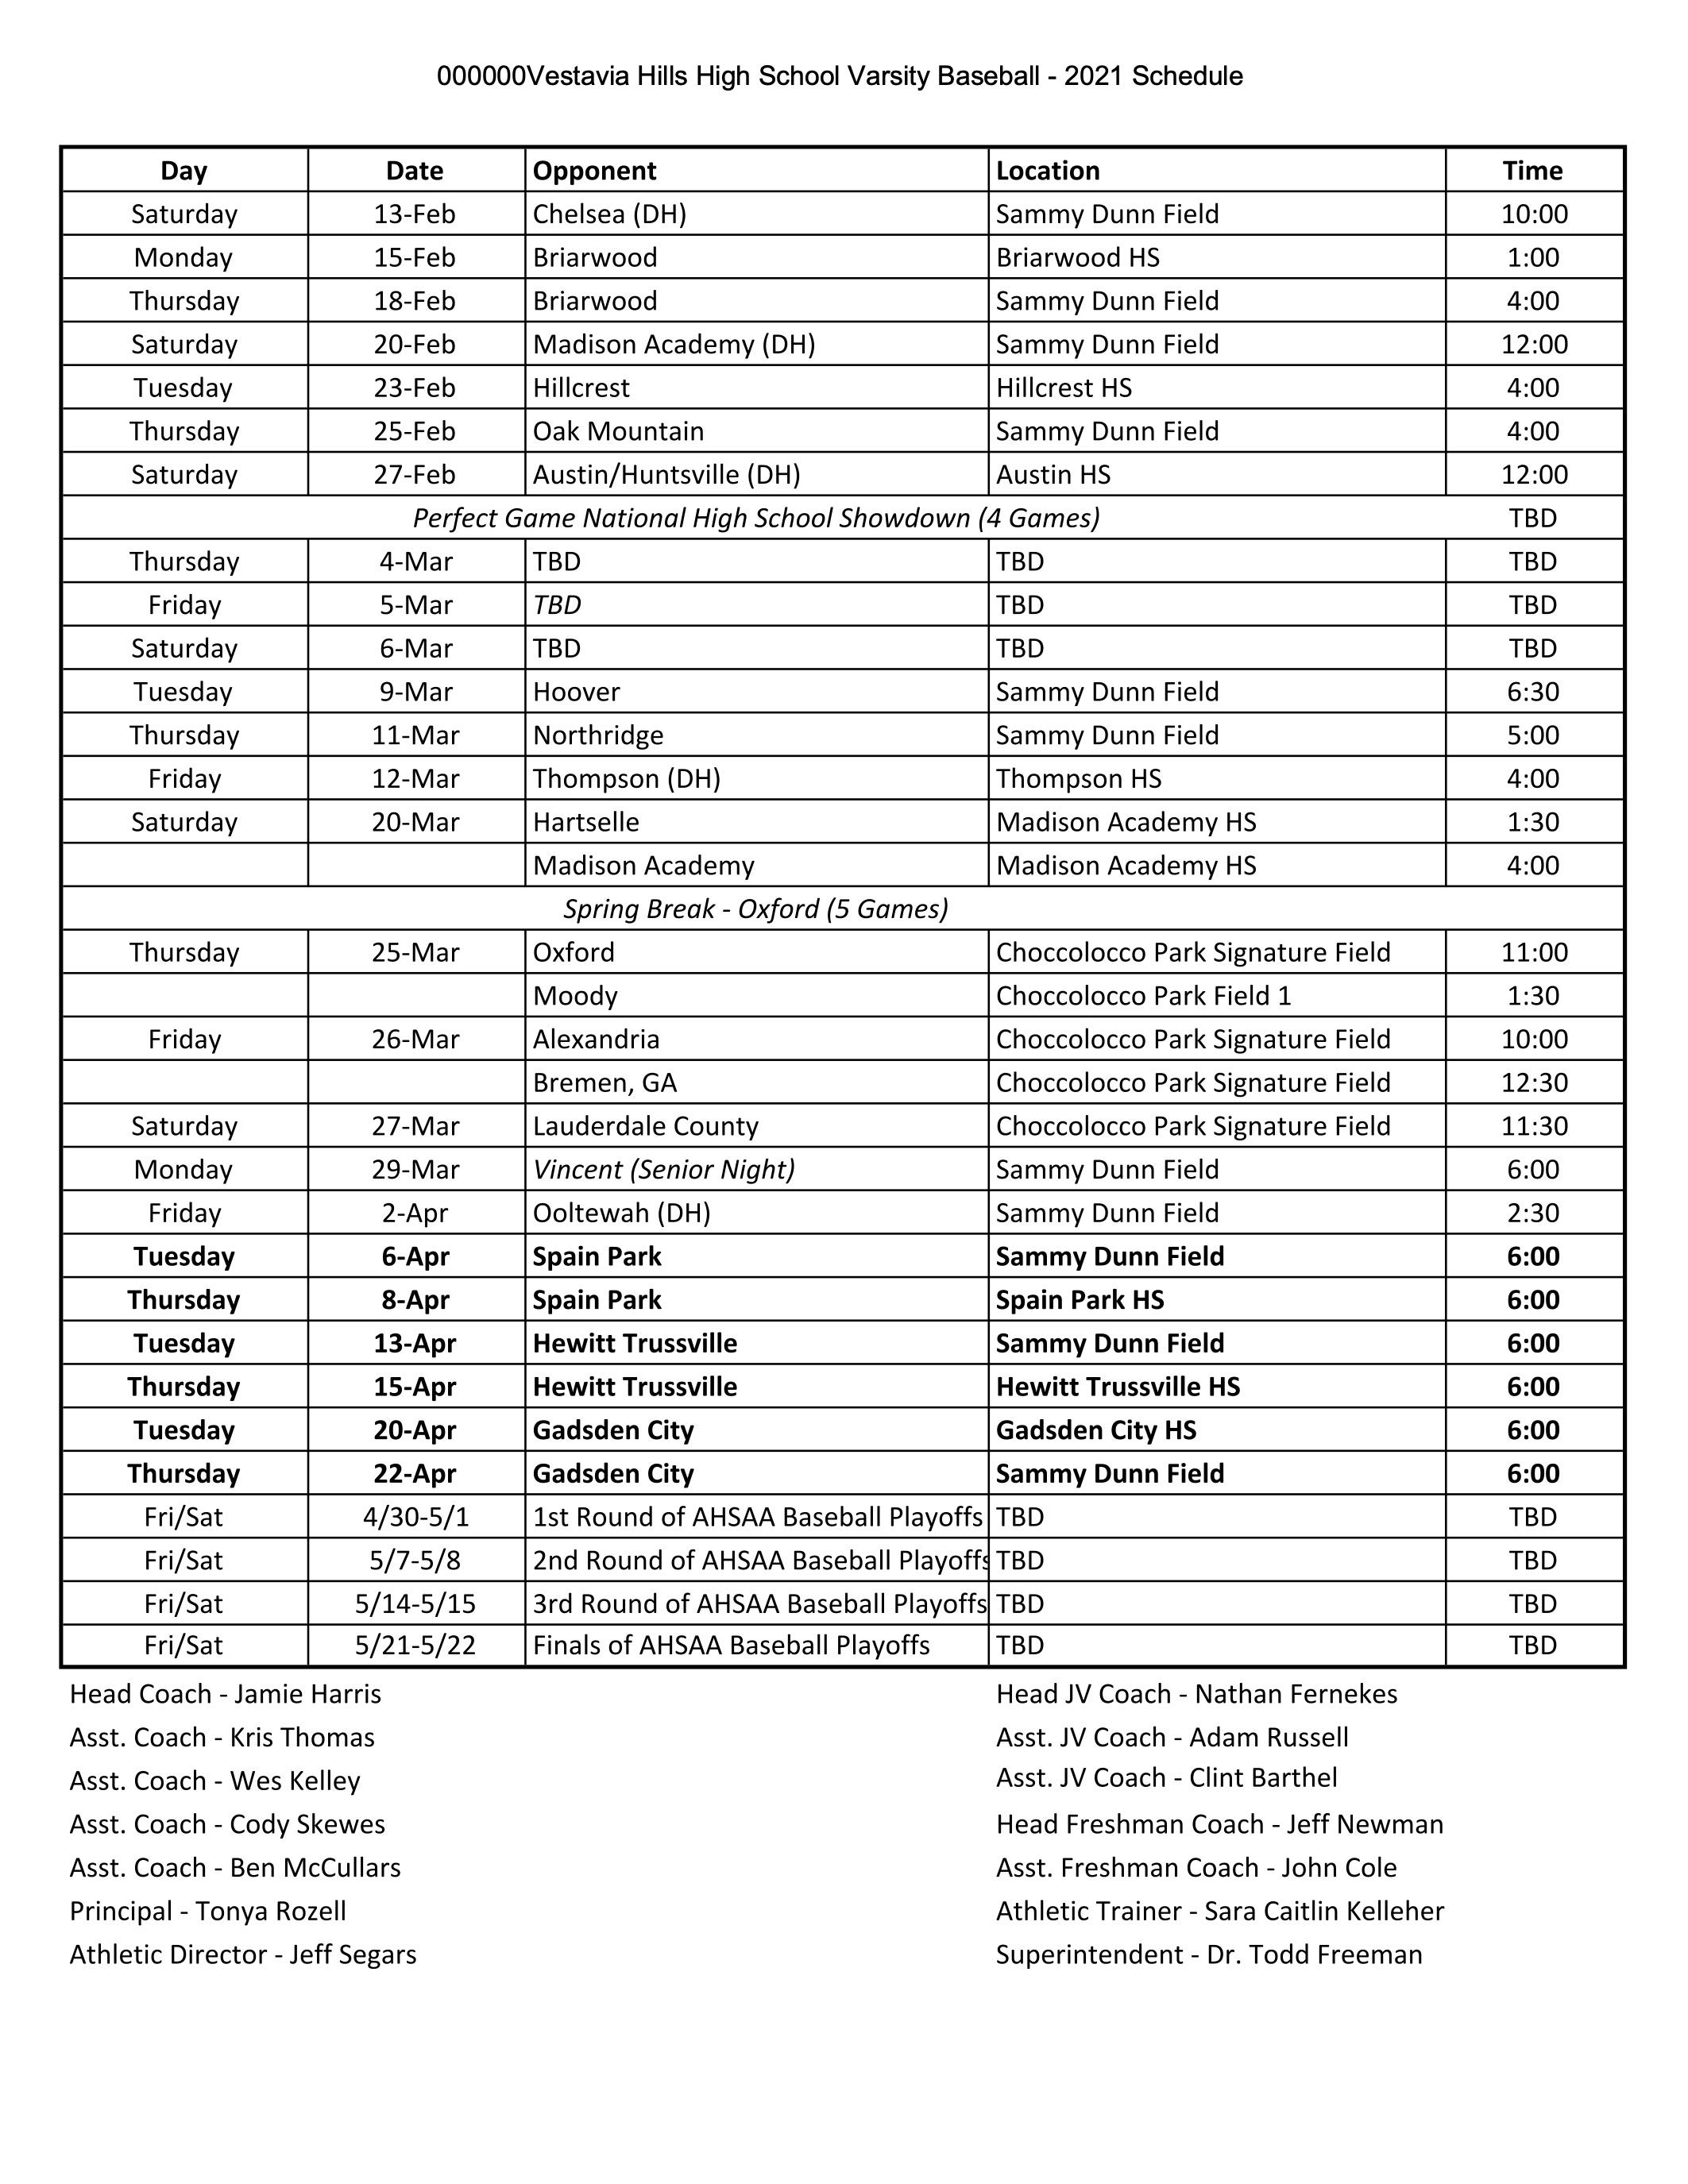 2021 Varsity Schedule